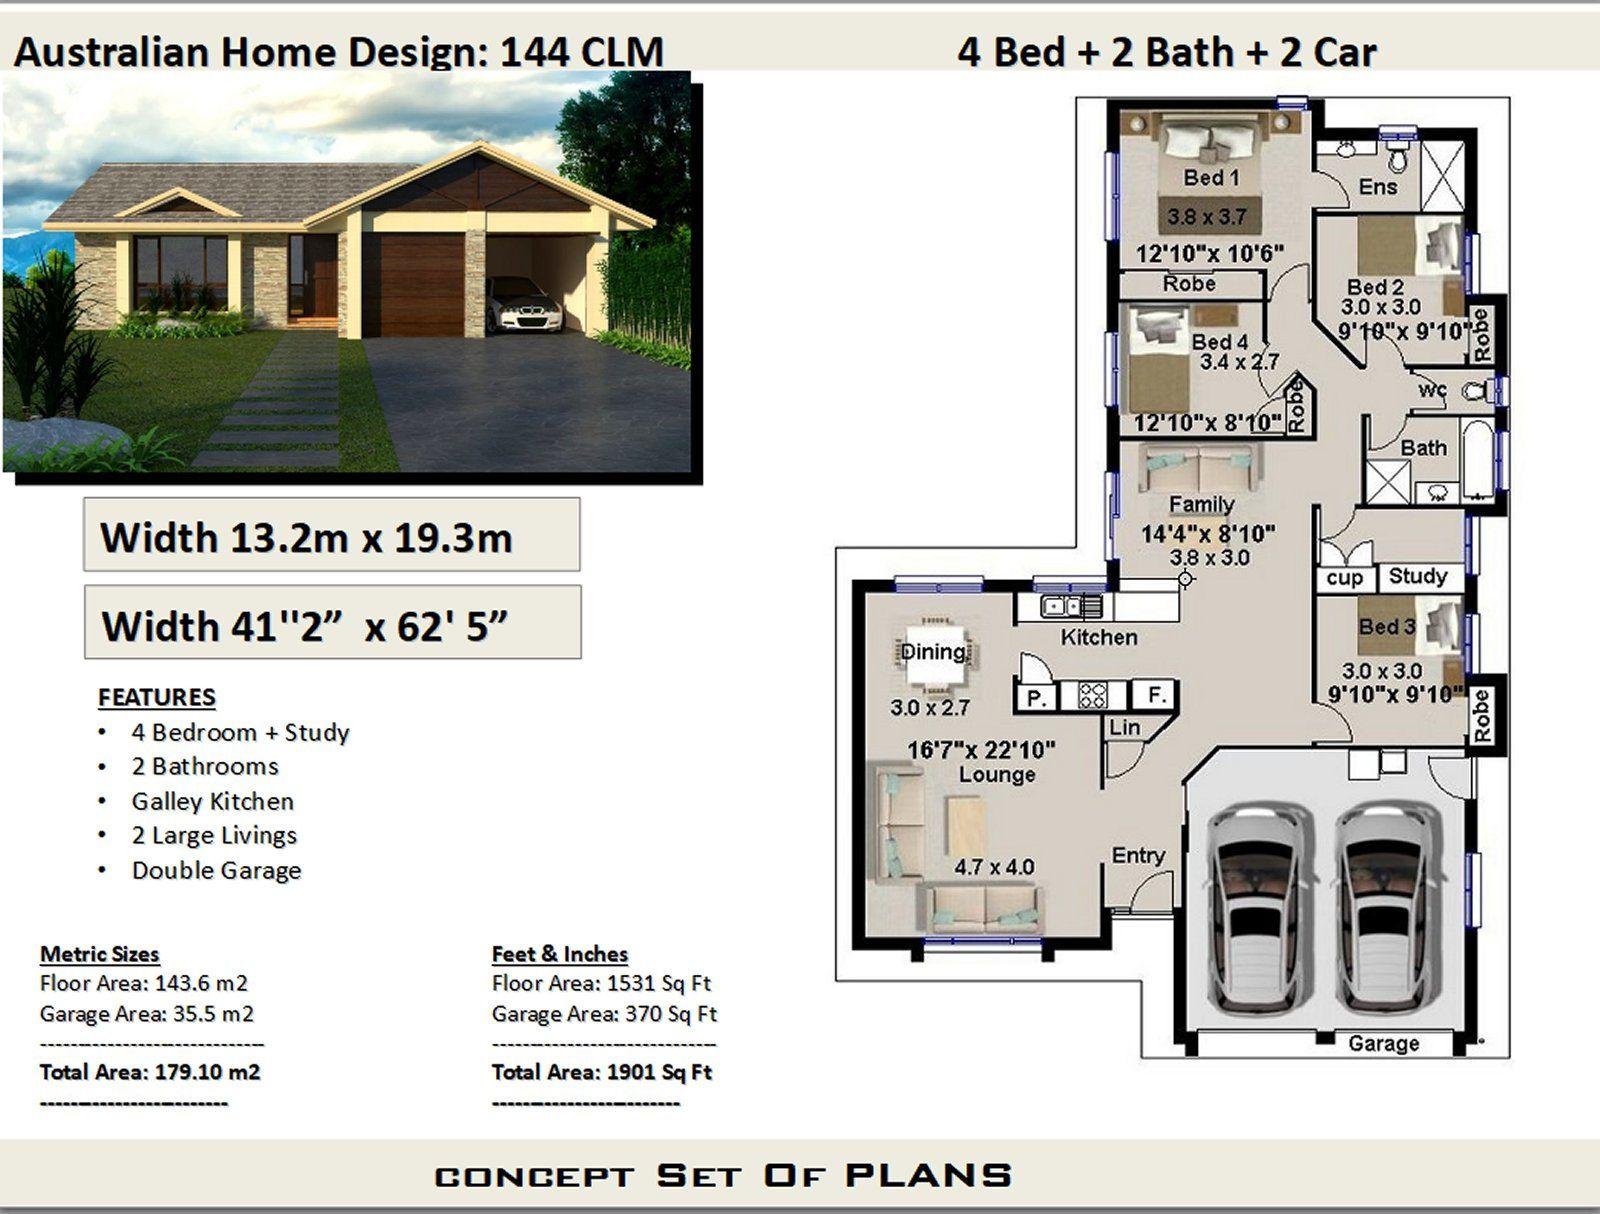 Narrow Lot 4 Bedroom House Plans Narrow Home Plans 4 Etsy Narrow Lot House Plans Bedroom House Plans House Plans Australia